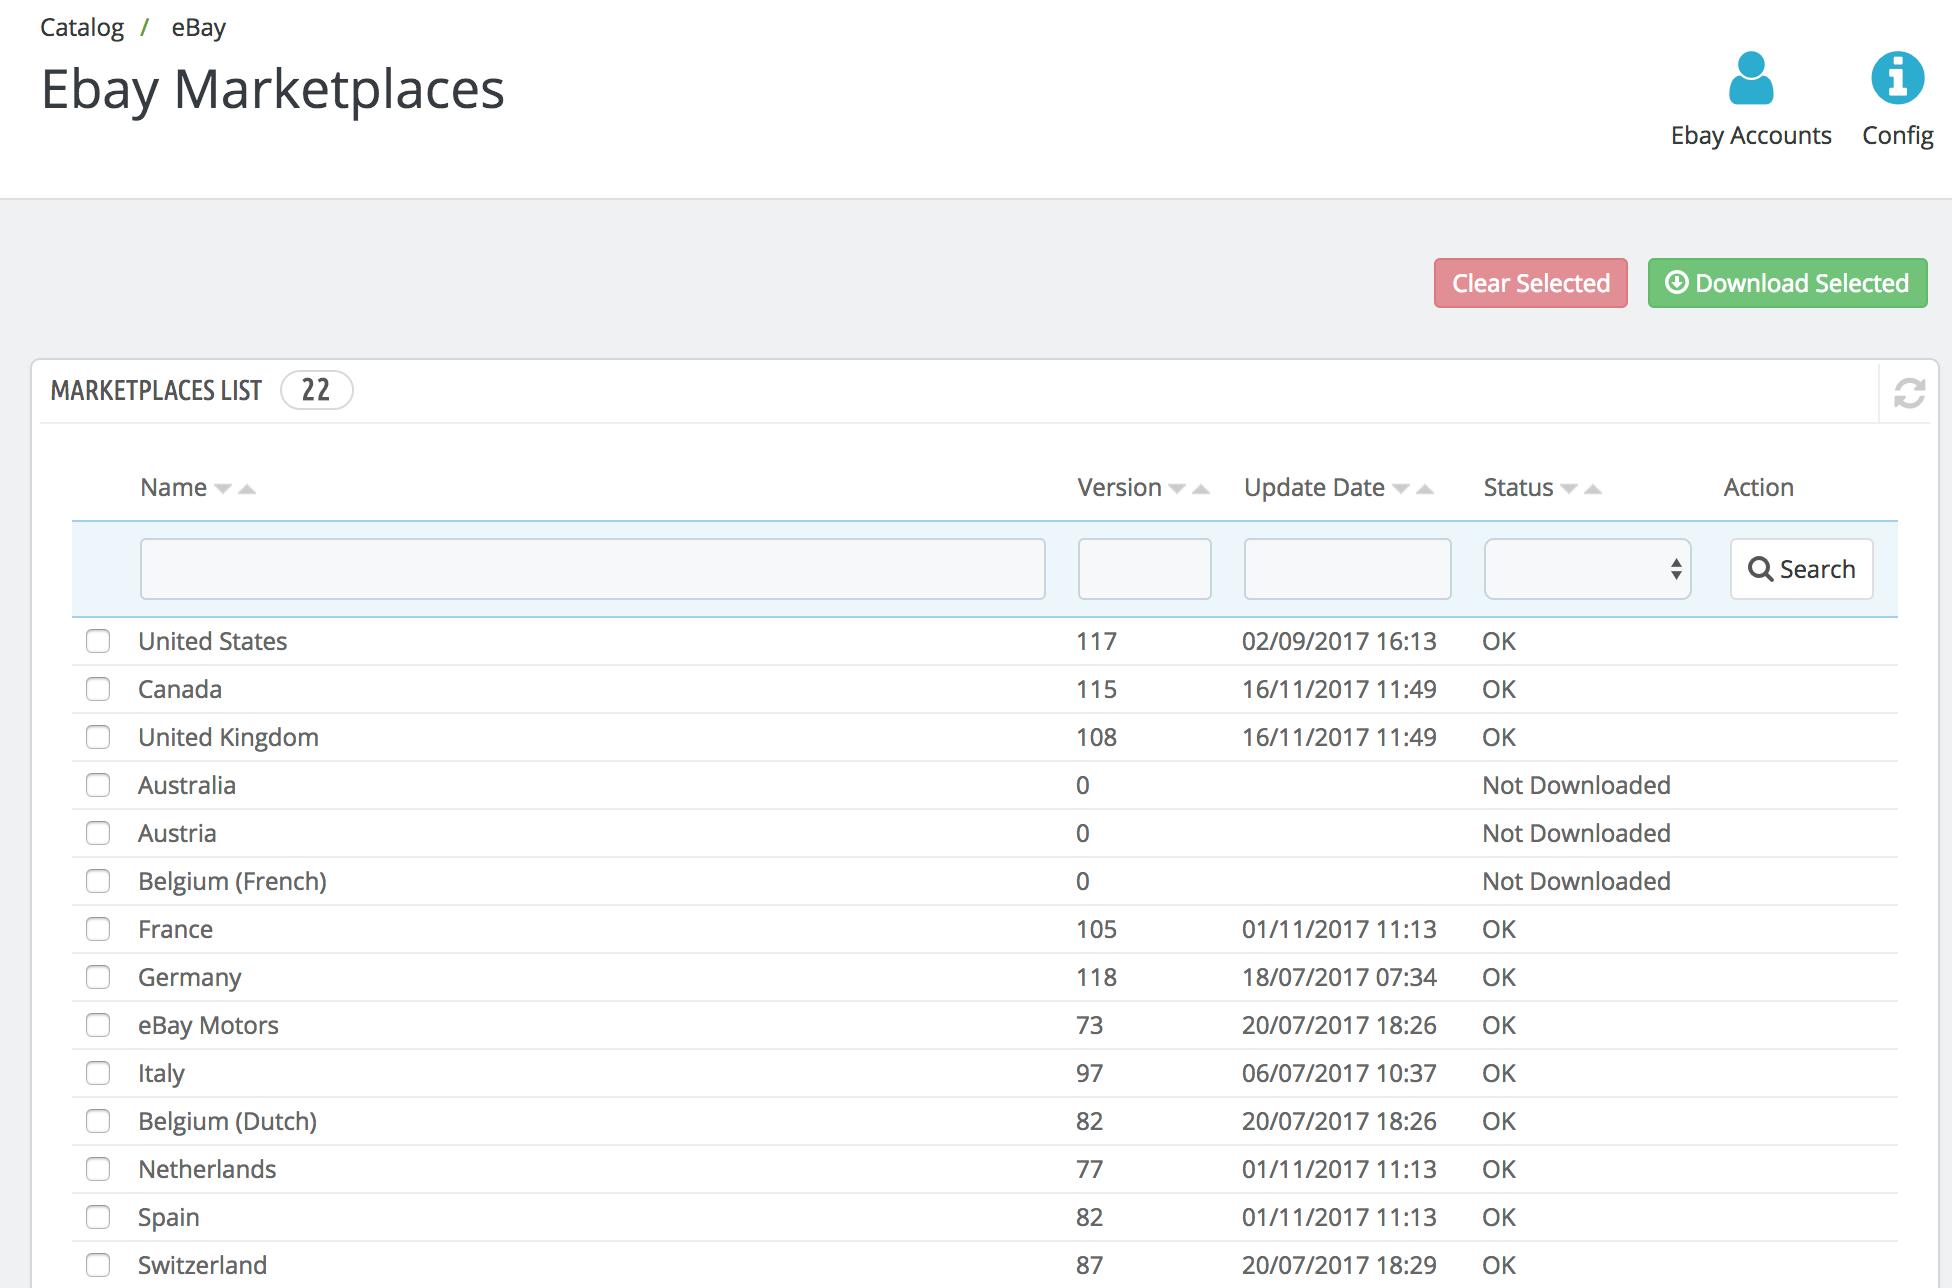 PrestaShop ebay module — Ebay Marketplace Information